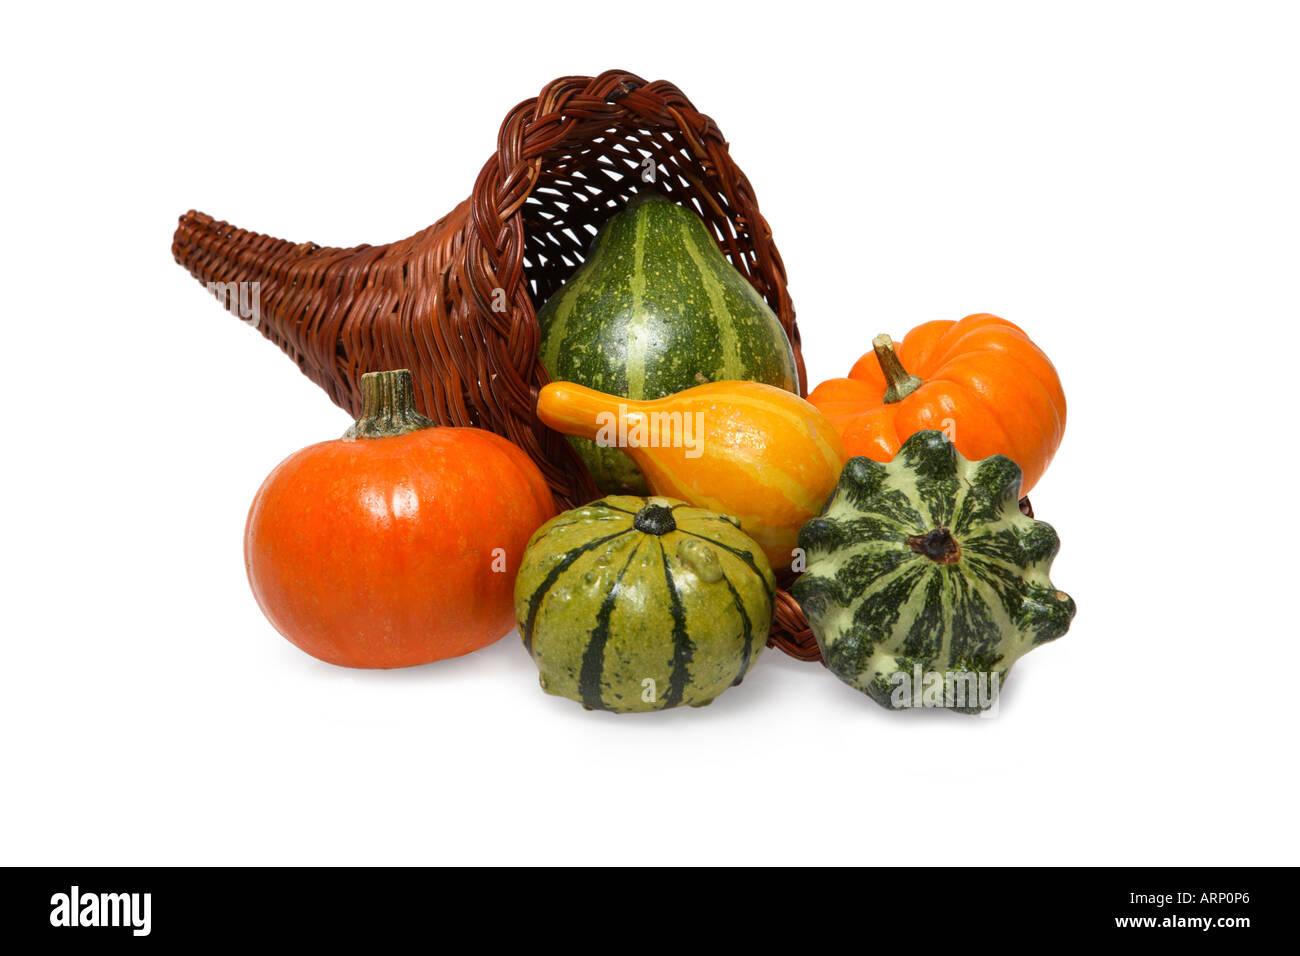 Cornucopia of Colorful Fall Gourds - Stock Image